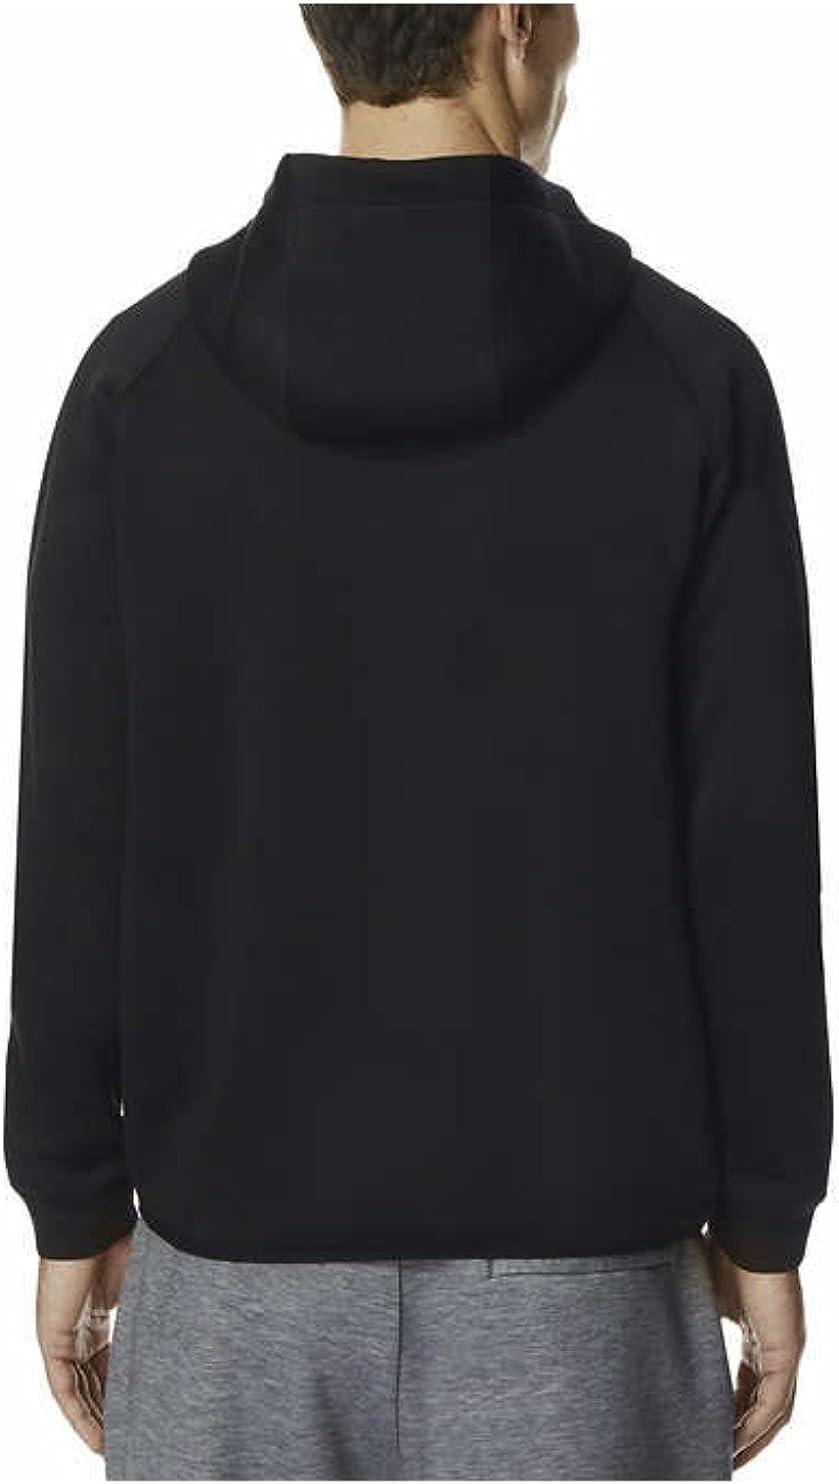 32 Degrees Heat Men/'s Tech Fleece Performance Pants H Black